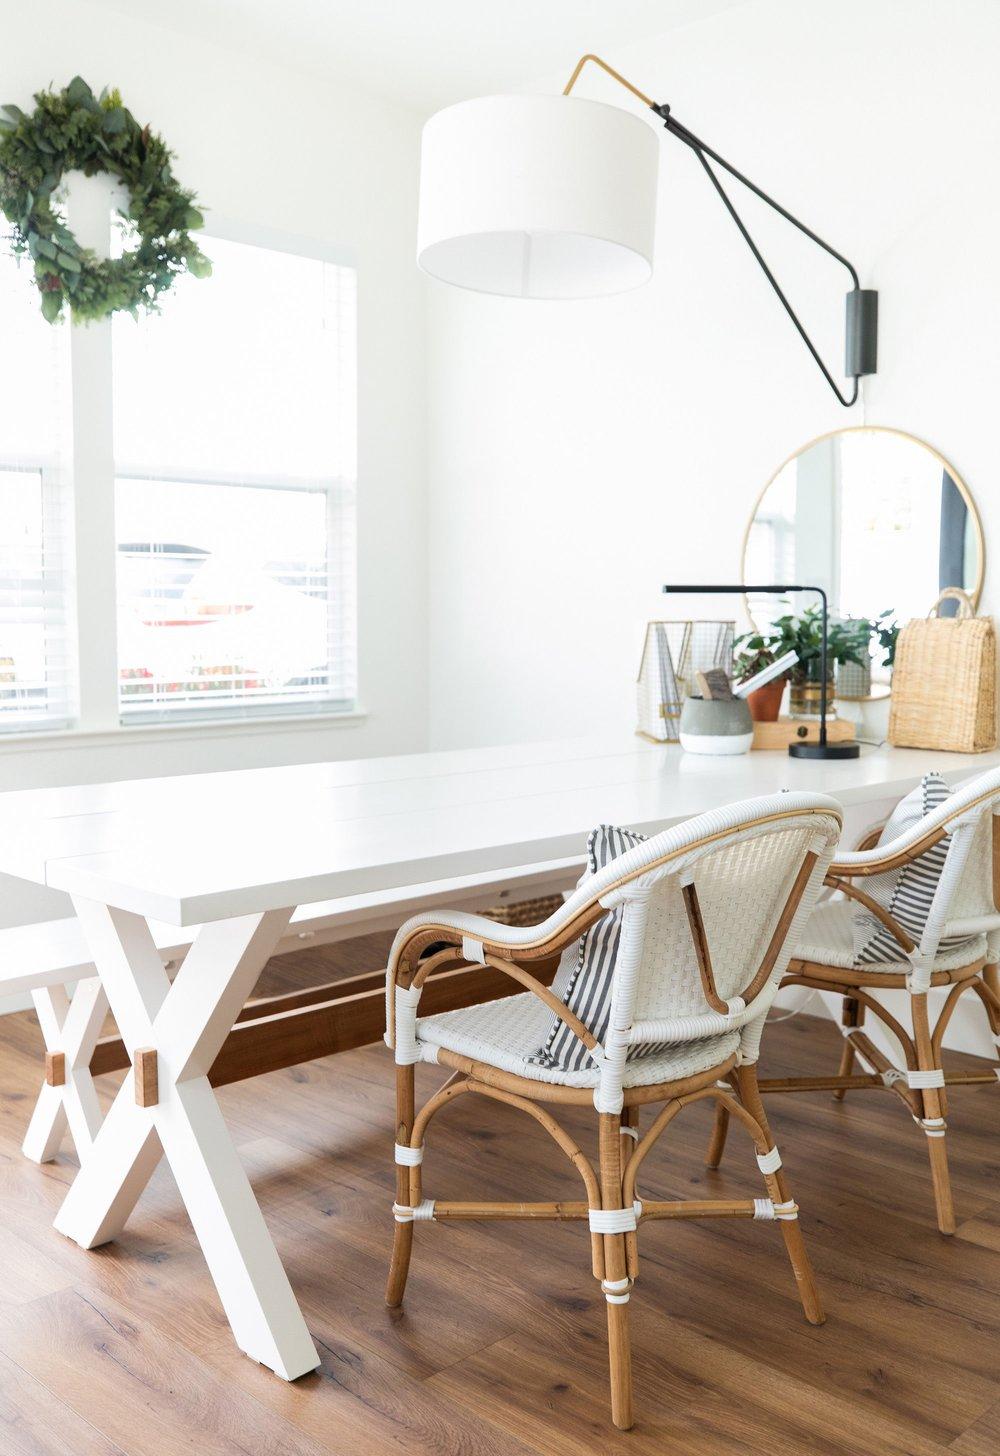 Tami+Faulkner+Design%2C+Interior+Design%2C+Sacramento+CA